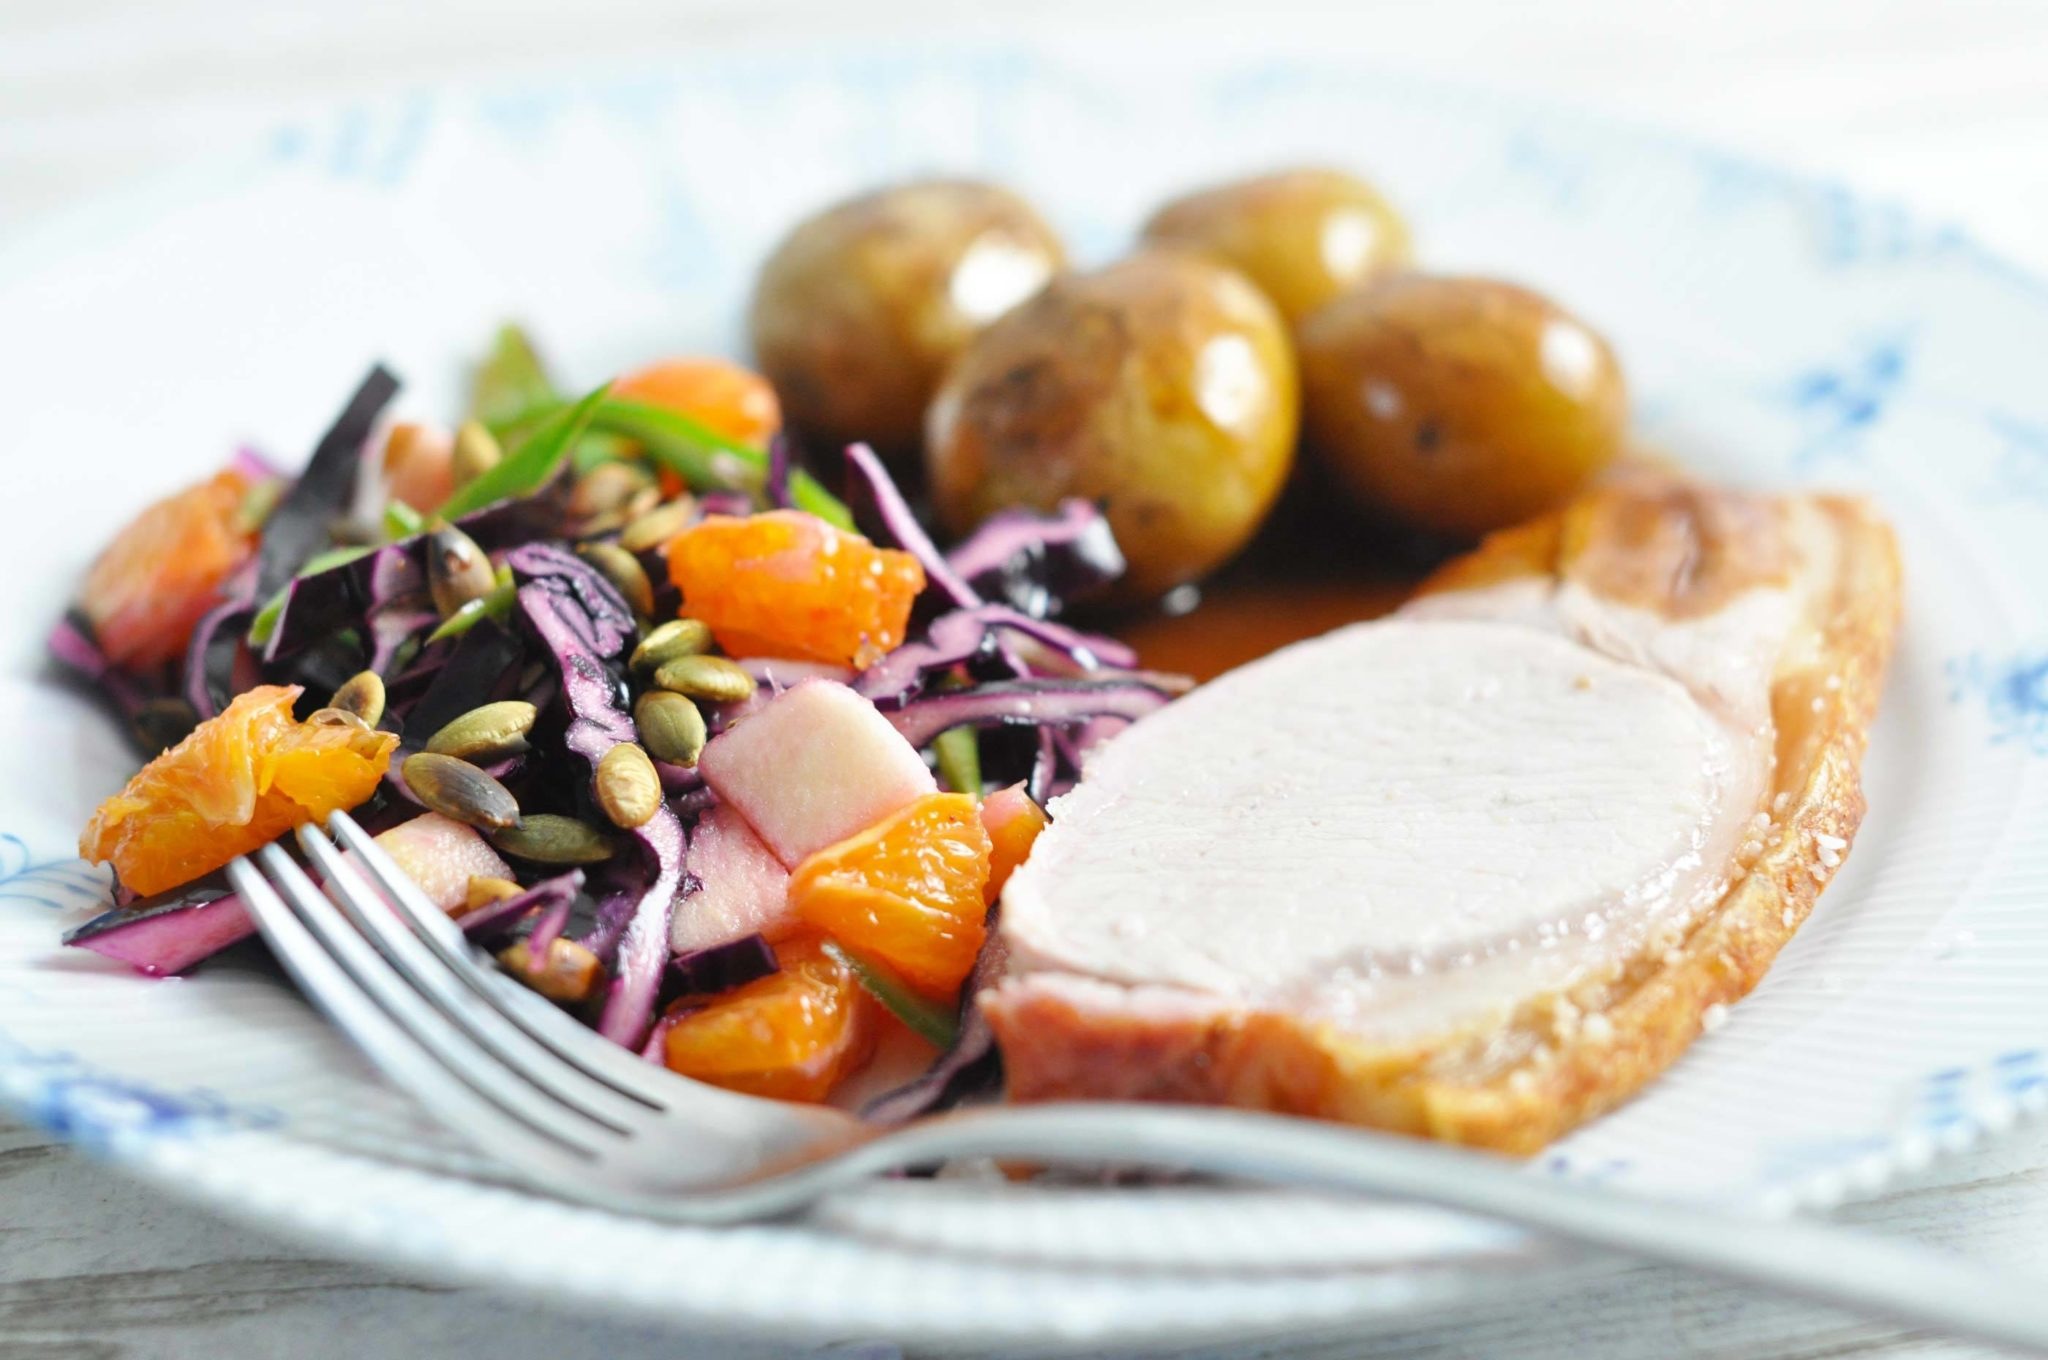 Grillstegt Flæskesteg Med Rødkålsalat Kartofler Og Skysauce